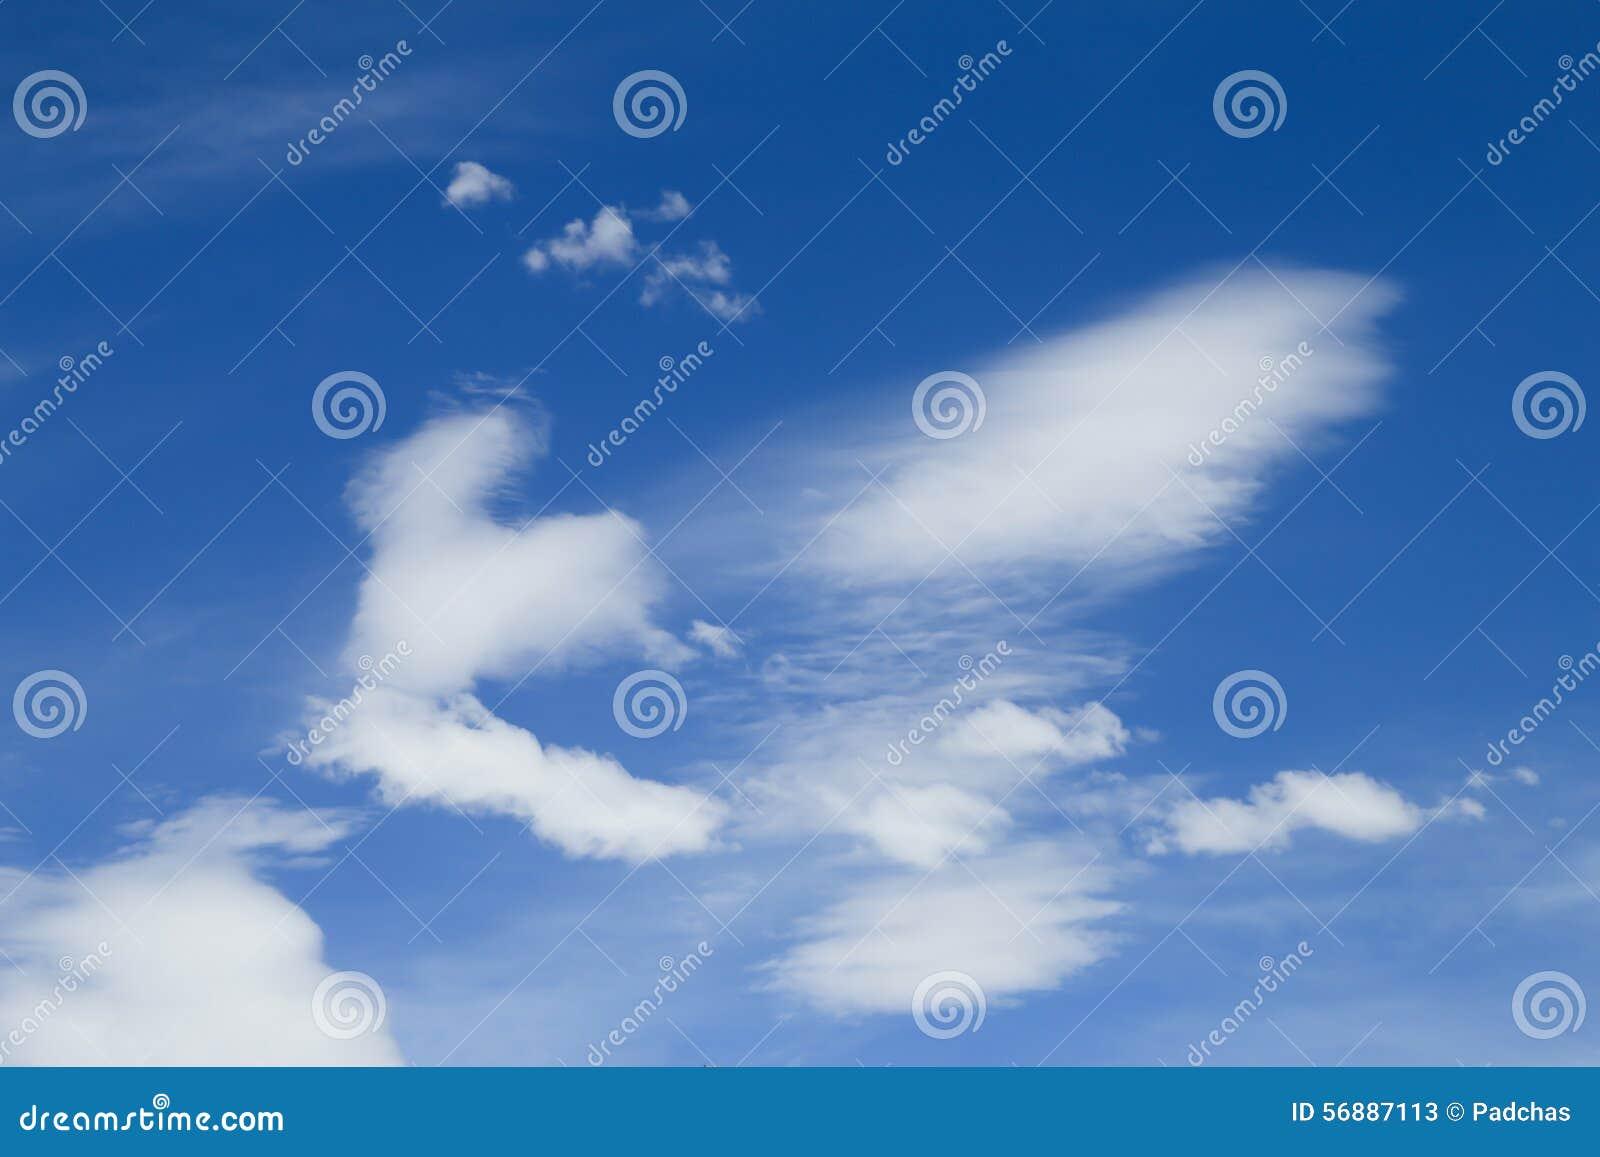 Błękitny zbliżenia chmury niebo